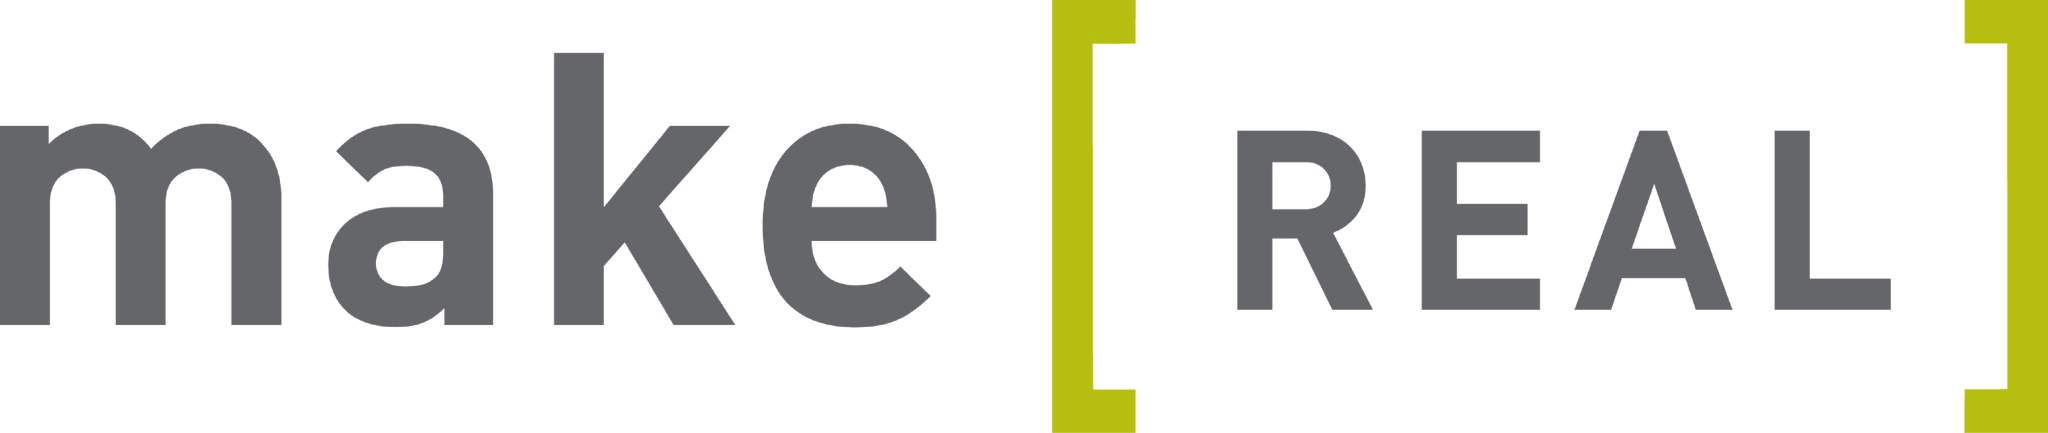 logo of Consumer Electronics Show